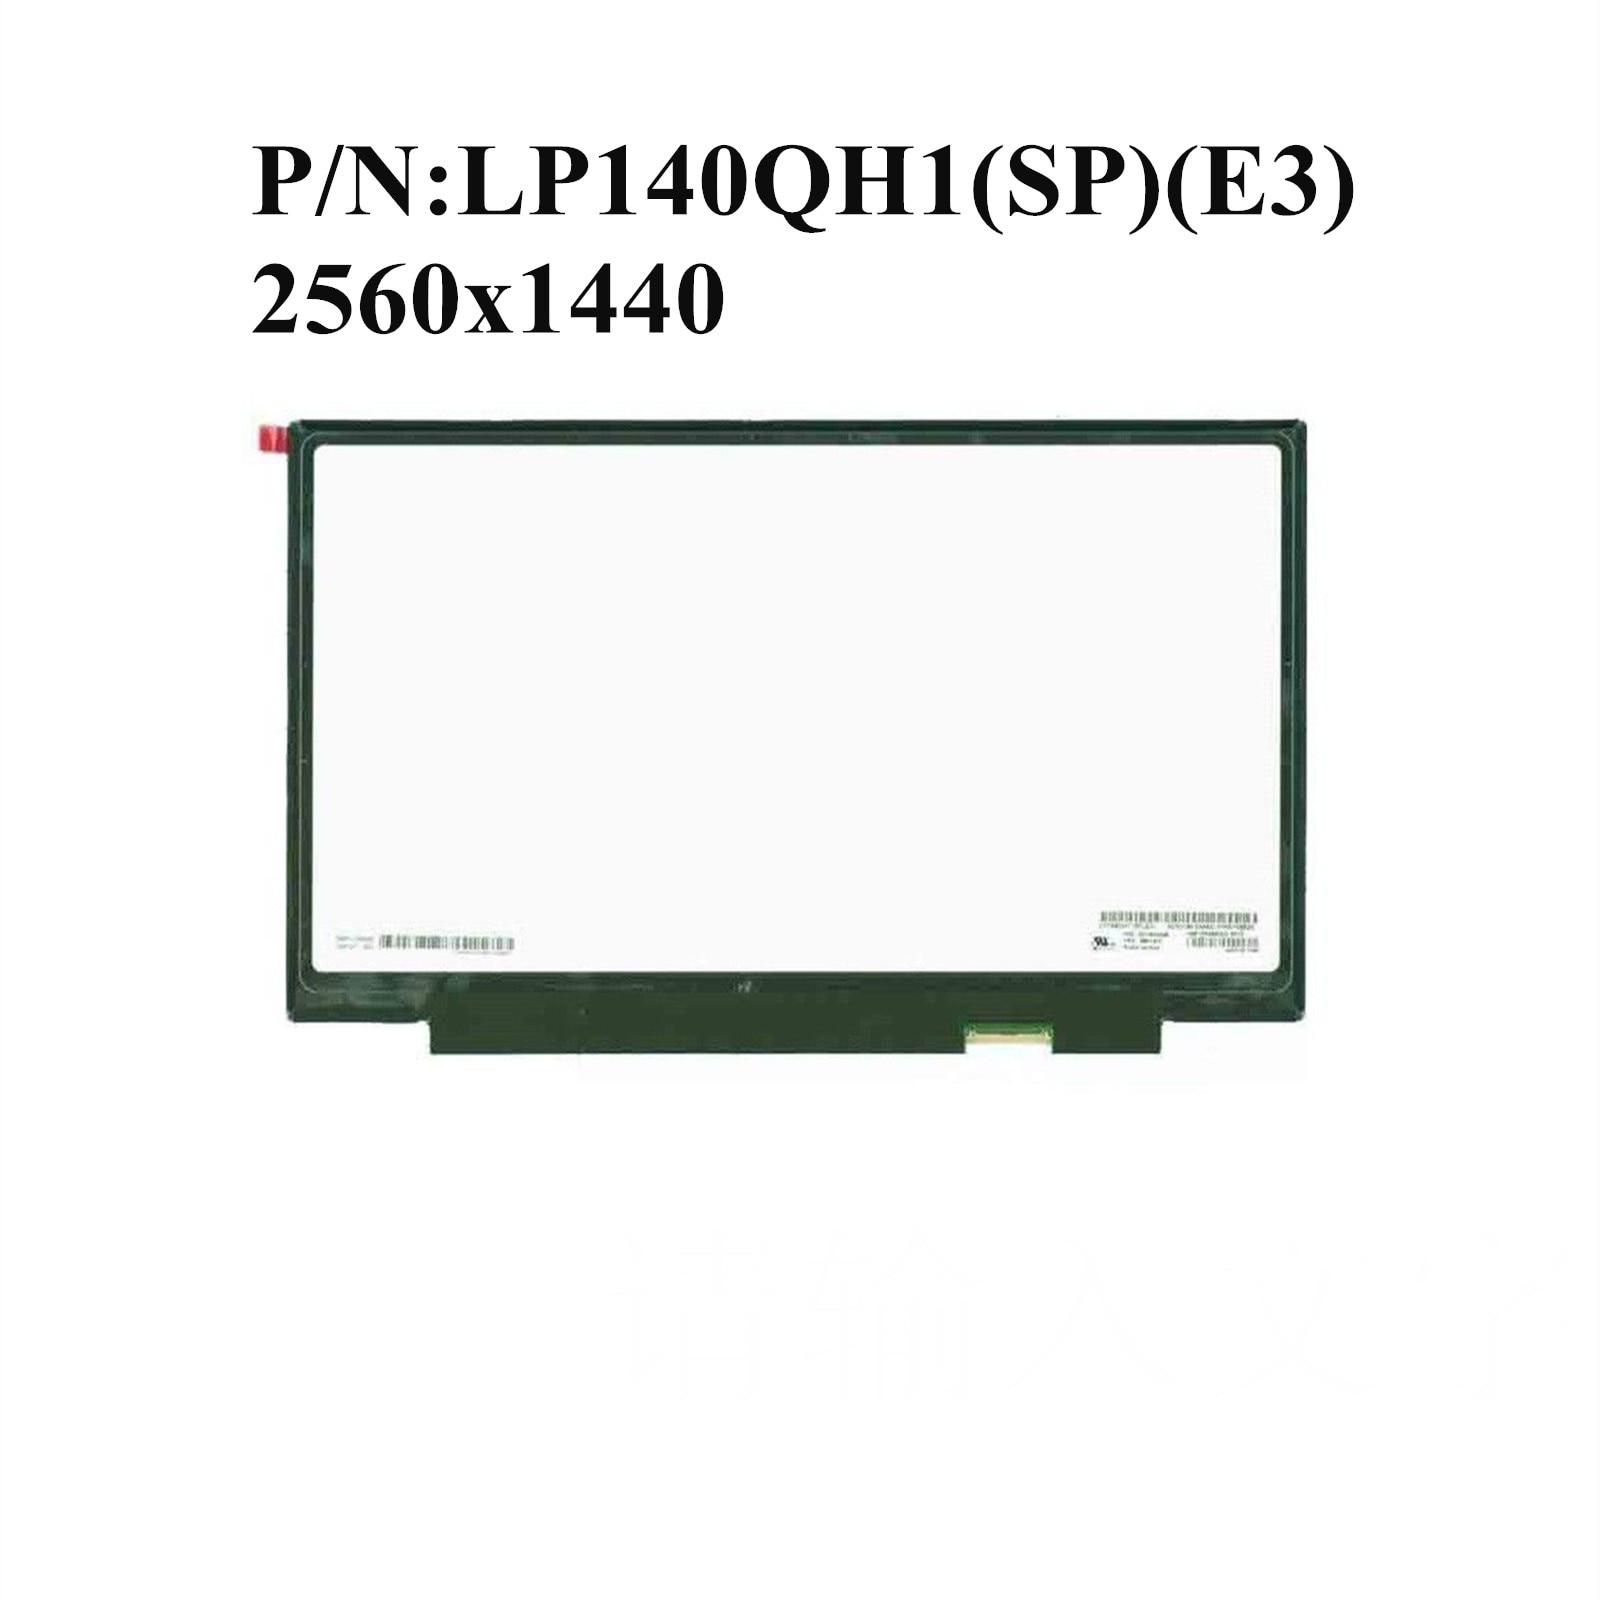 Original para Lenovo Thinkpad Yoga X1 QHD LP140QH1 (SP) (E3) montaje de pantalla táctil LCD de 40 Pines de 2560x1440